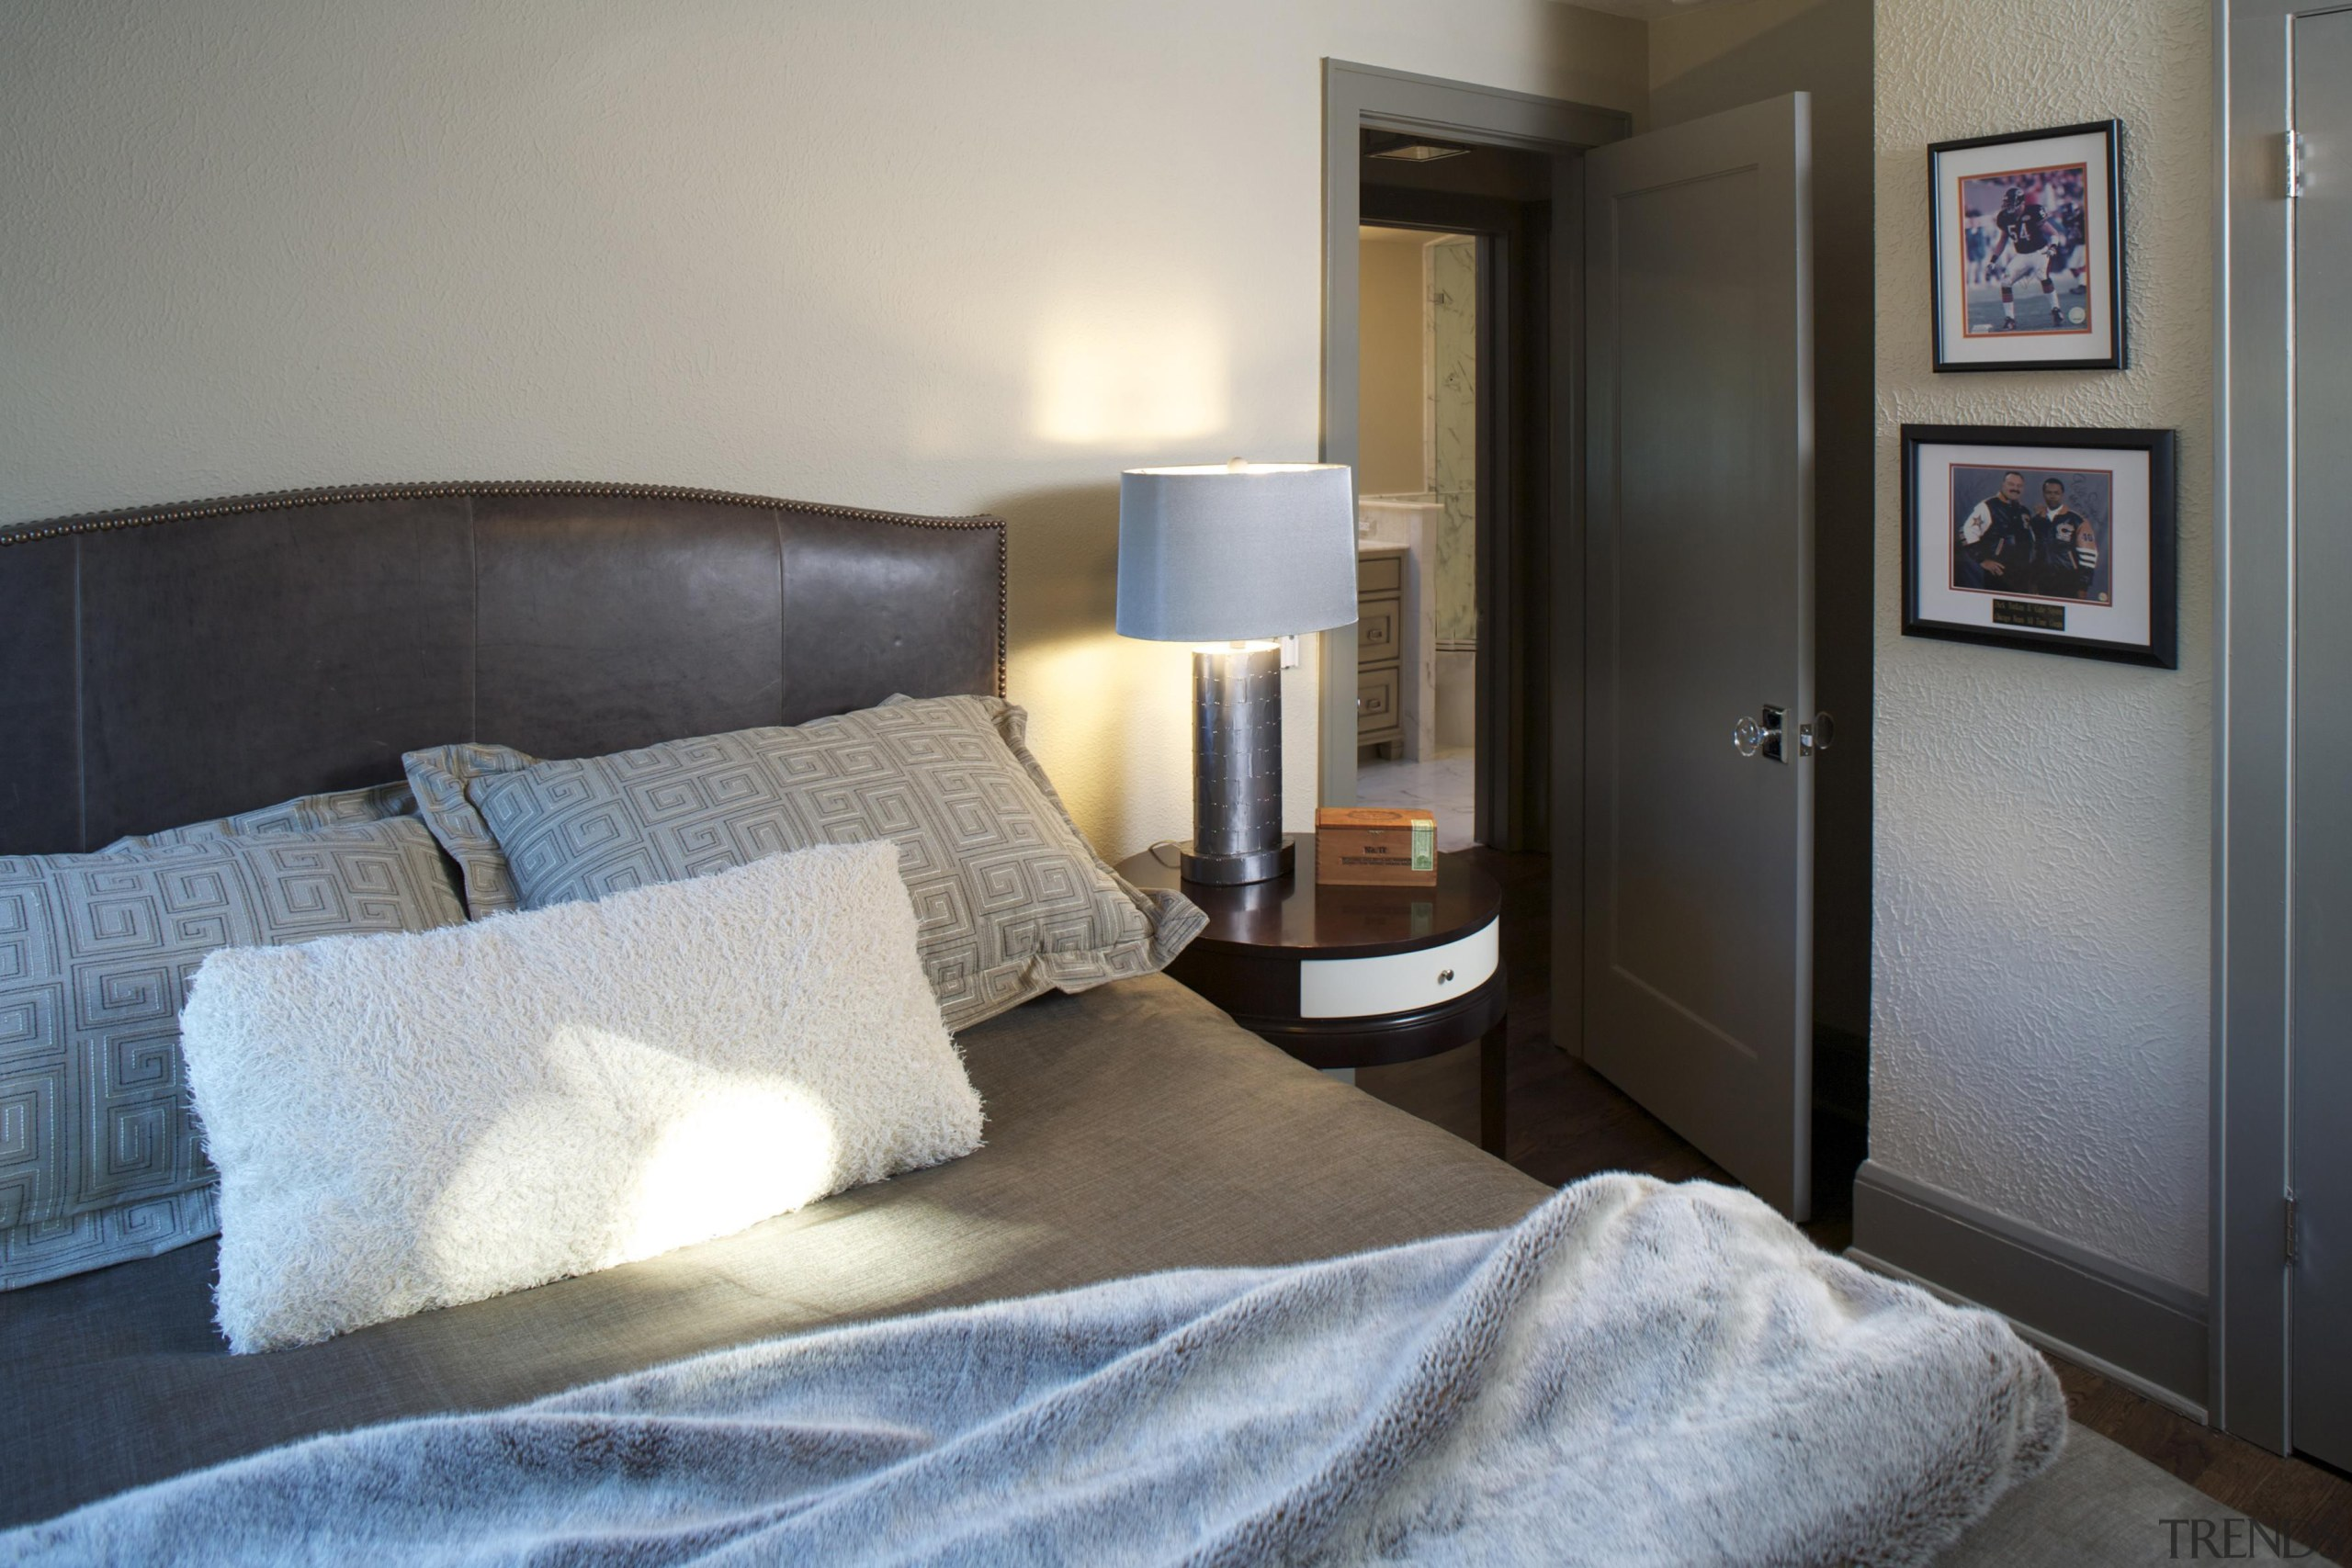 Historic Bungalow Renovation - College-Age Son's Bedroom - bed, bed frame, bedroom, home, interior design, property, real estate, room, suite, gray, black